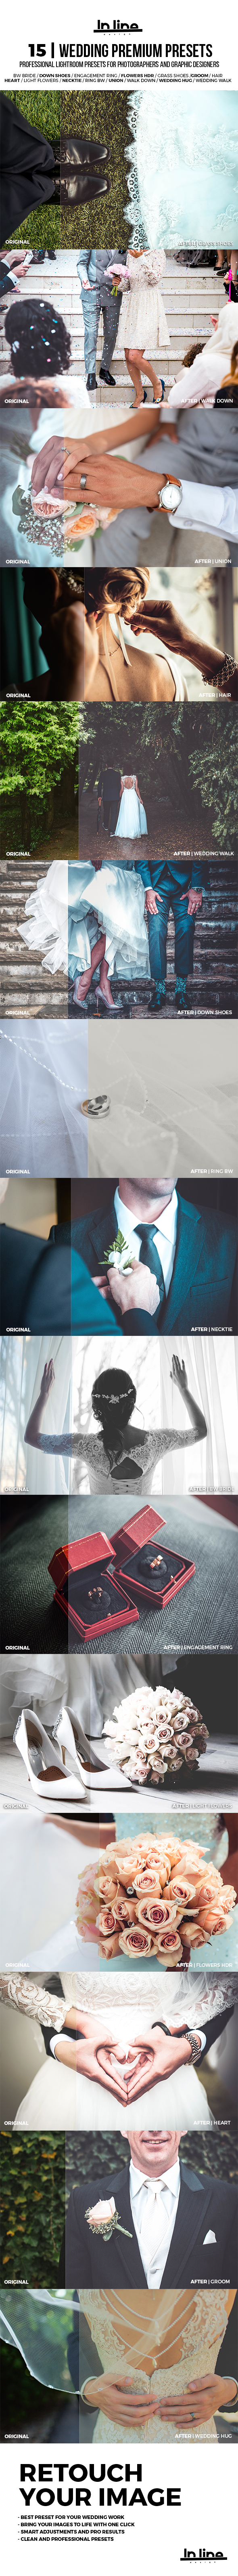 15 Premium Wedding Lightroom Presets - Wedding Lightroom Presets